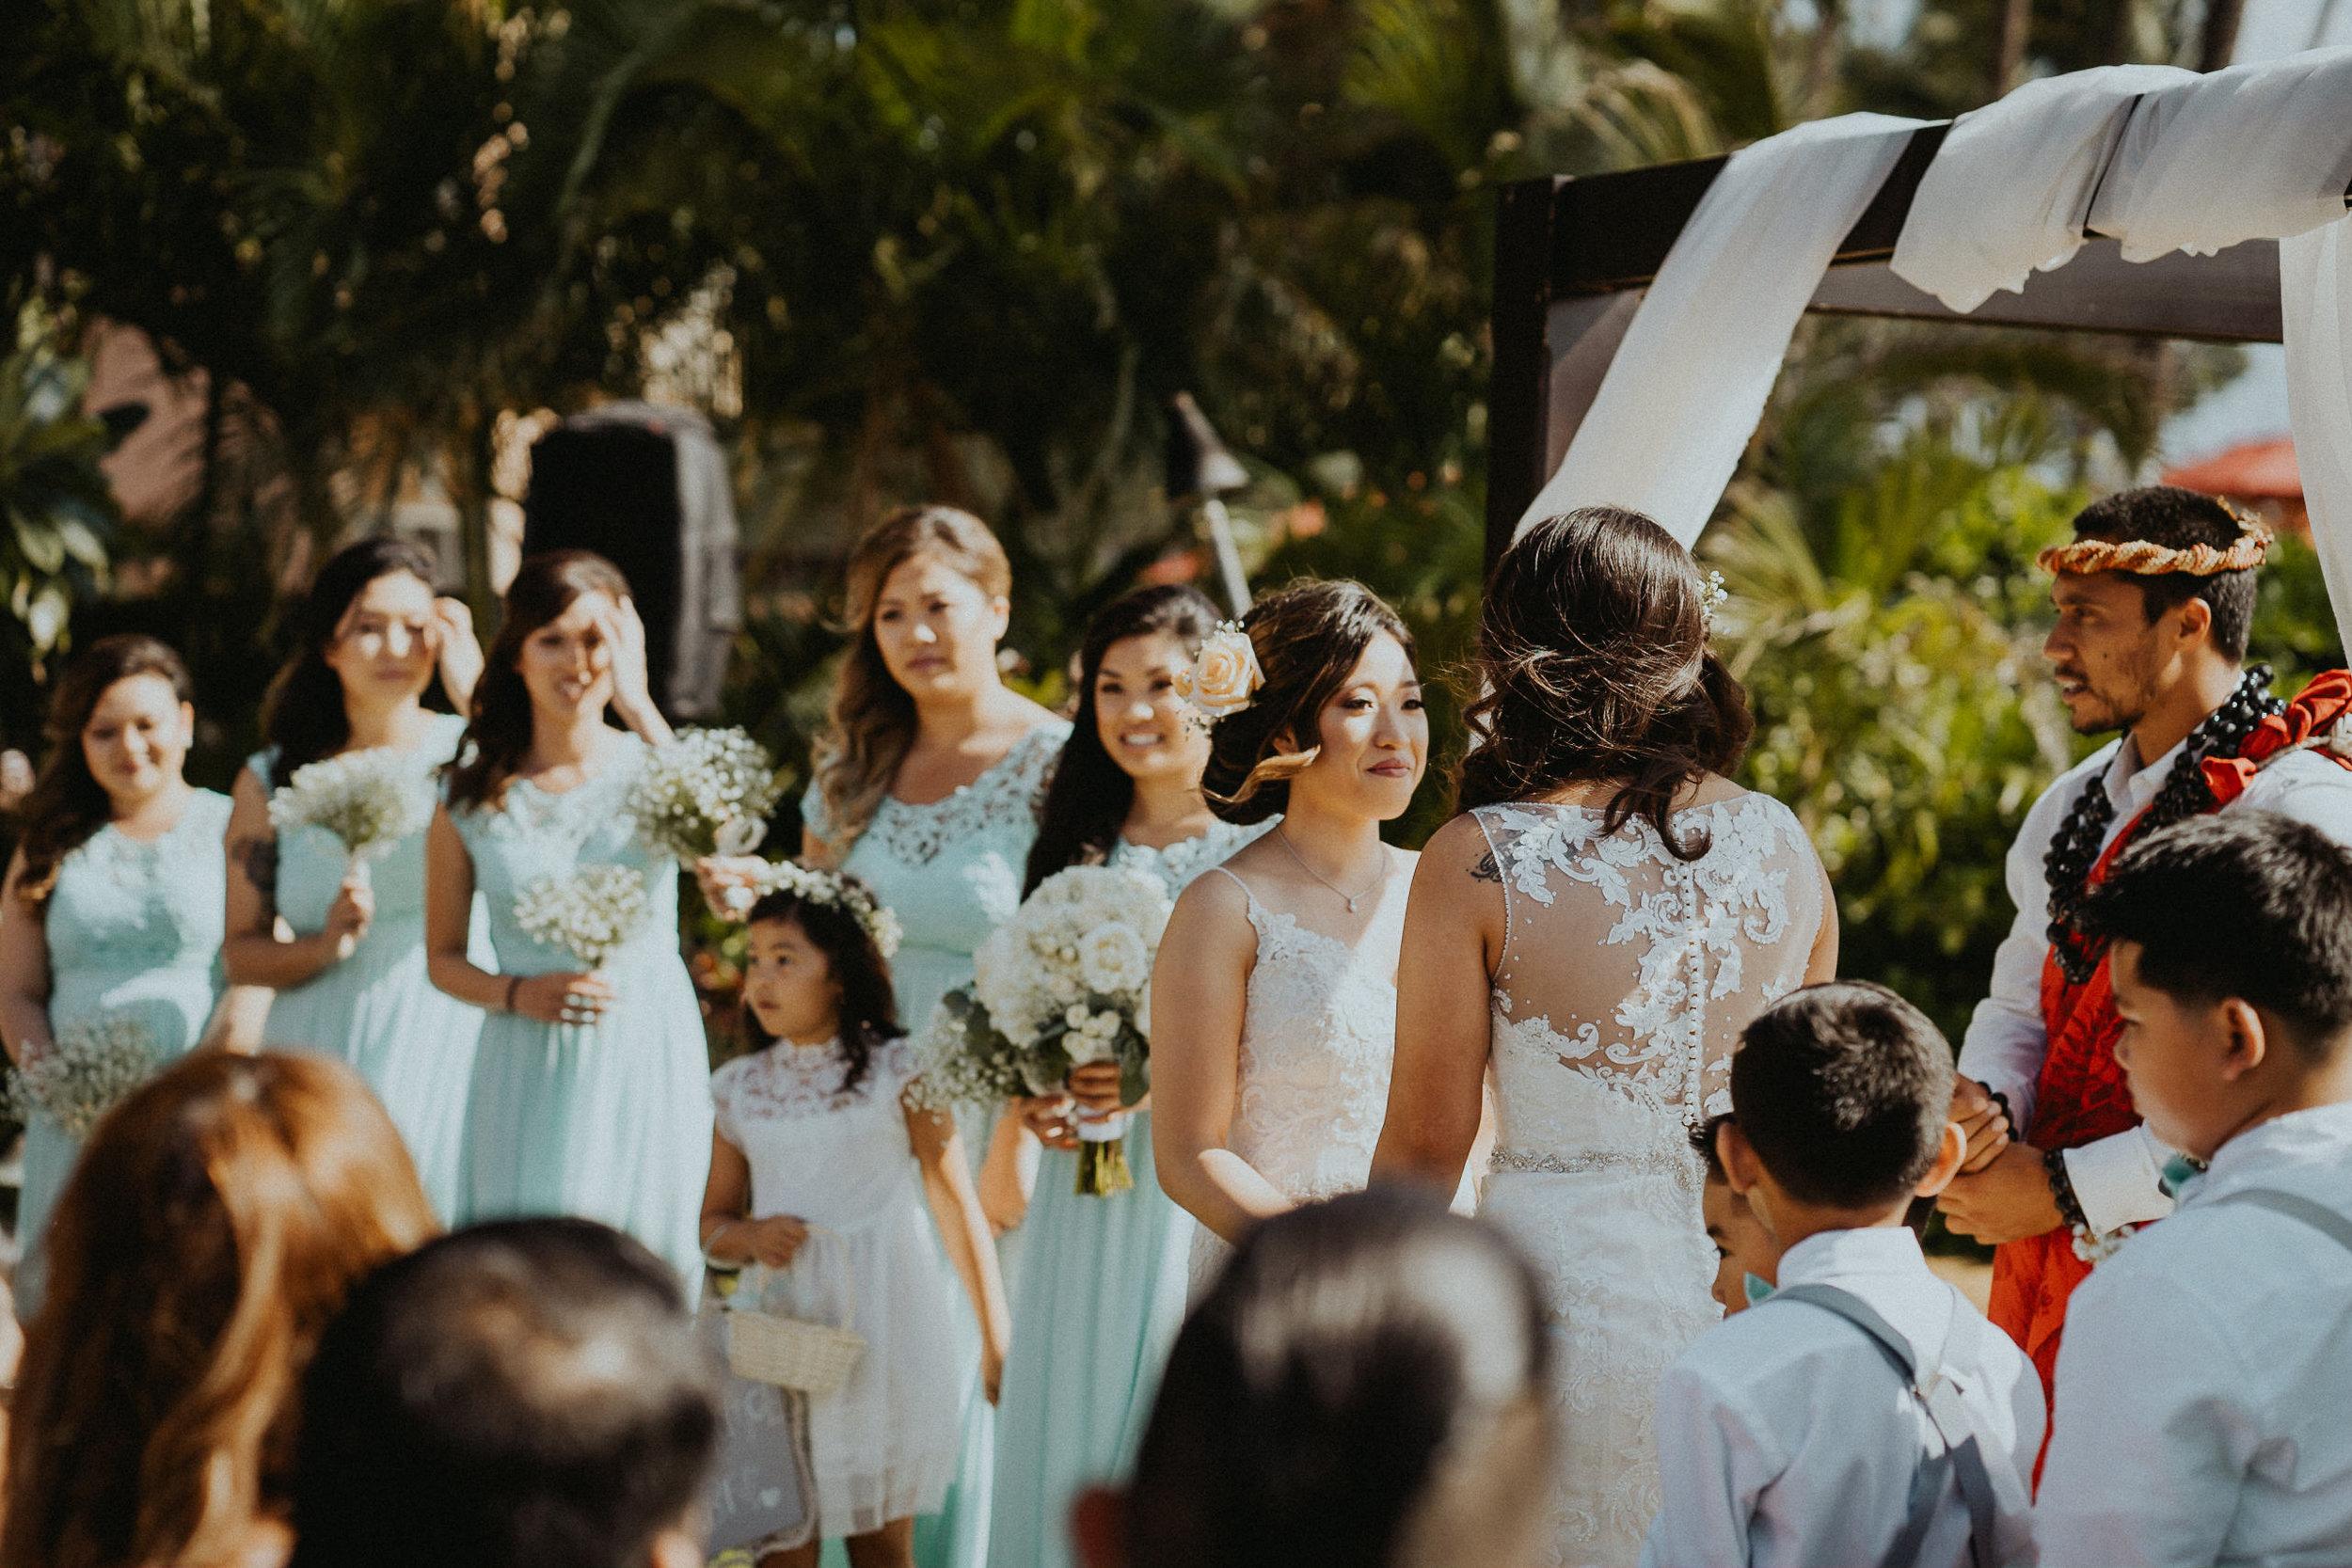 Maui_Destination_wedding_Alfred_Tang-3.jpg